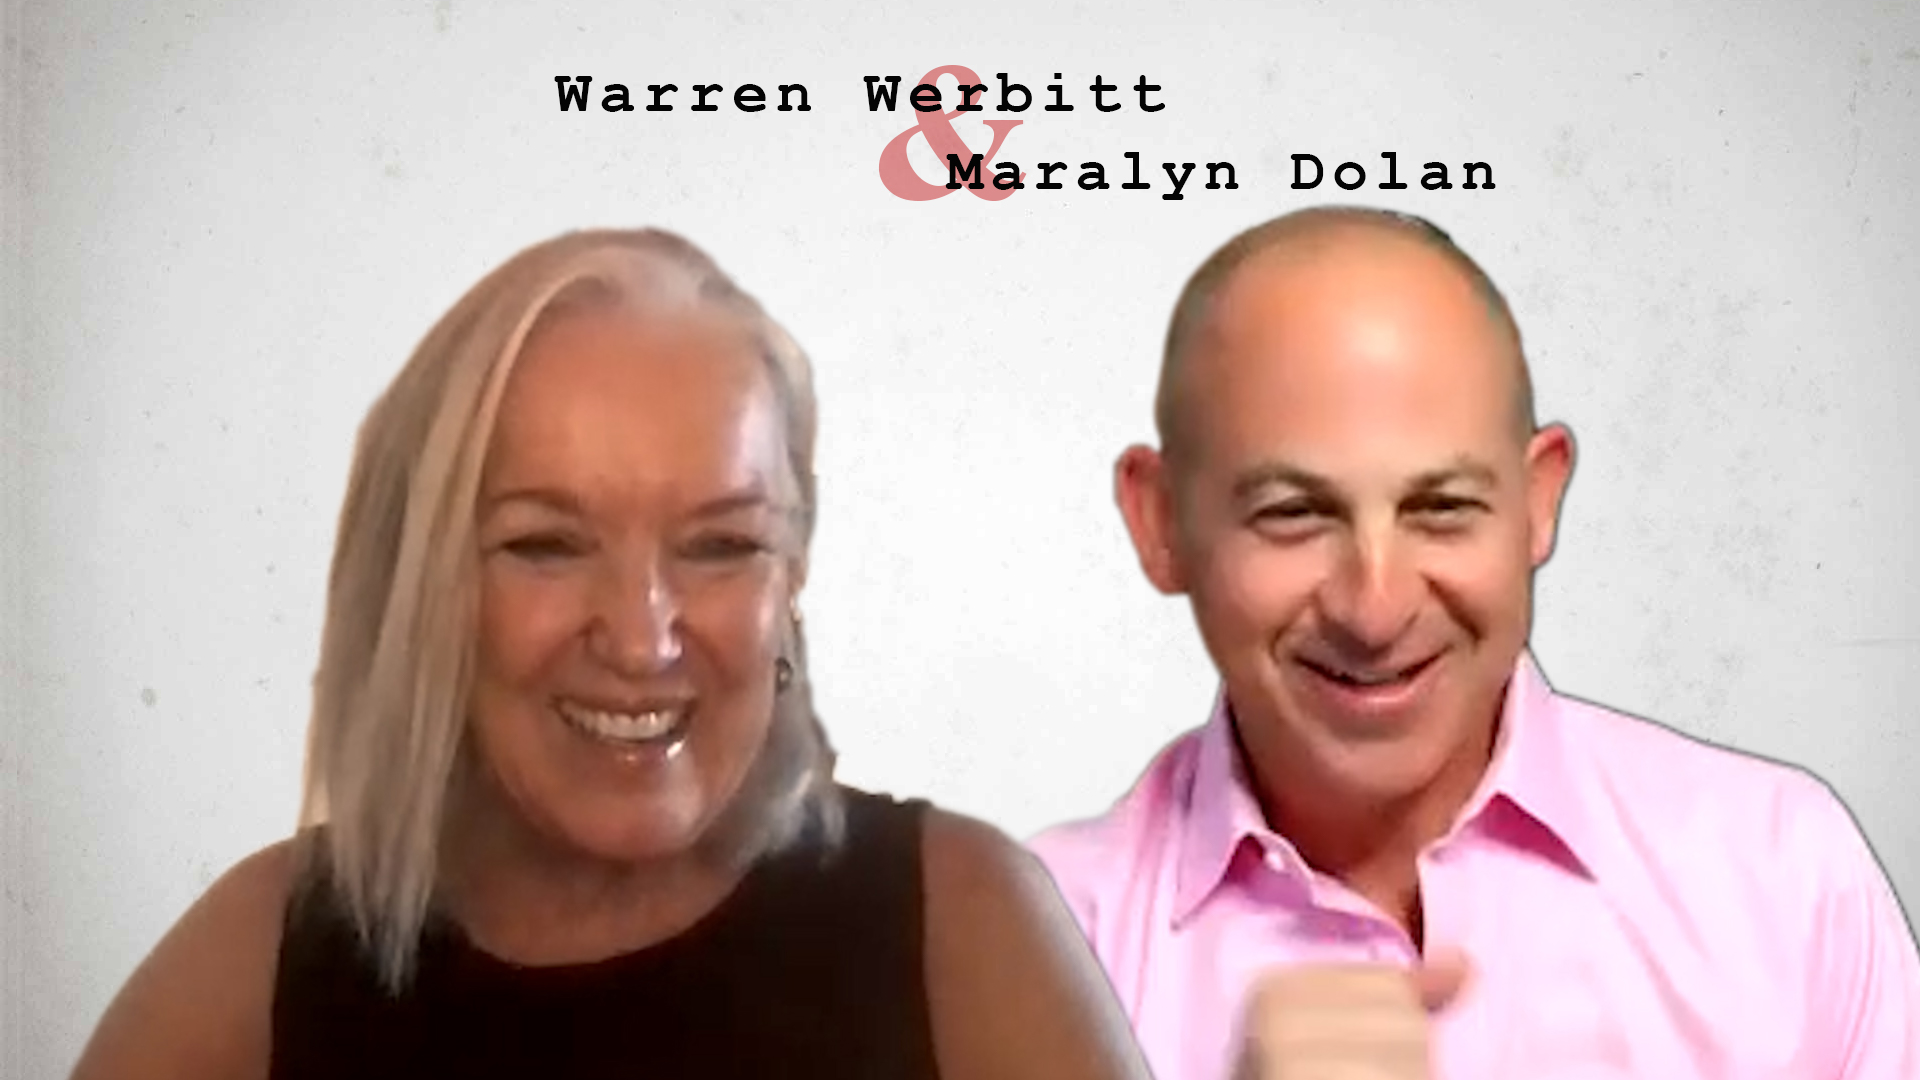 Video preview: Warren Werbitt Goes Printer to Printer with IPG's Maralyn Dolan